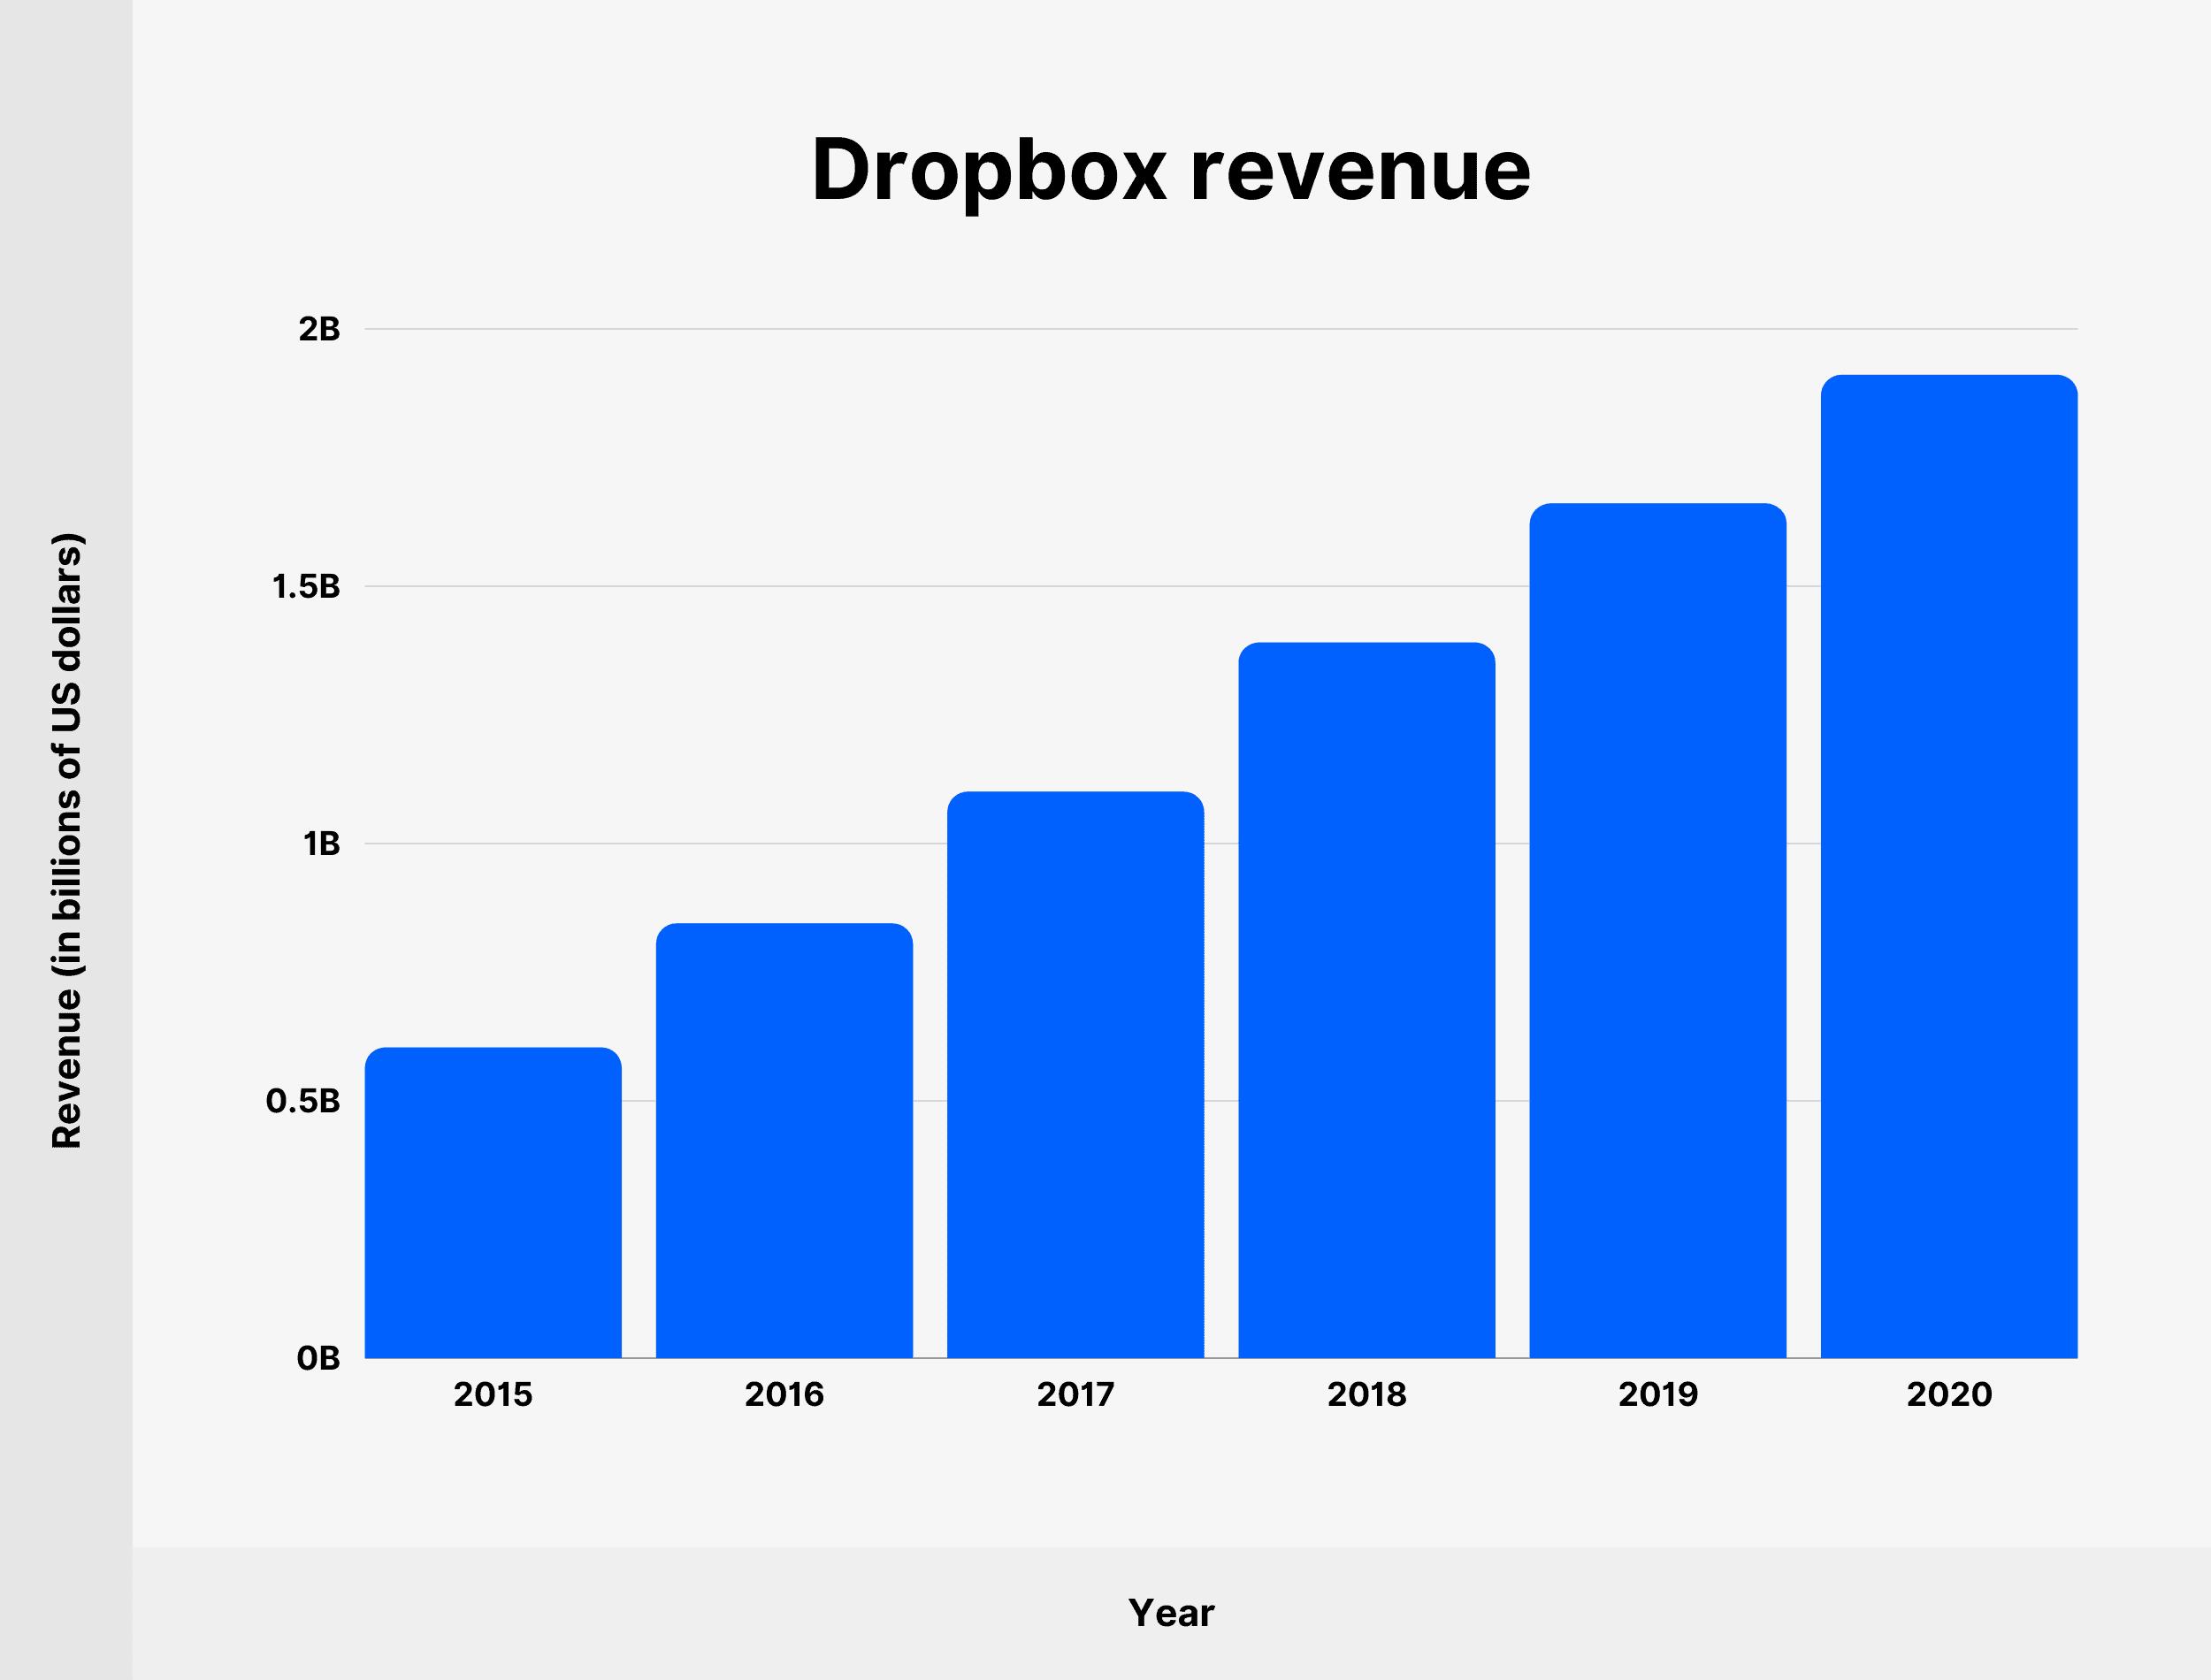 Dropbox revenue